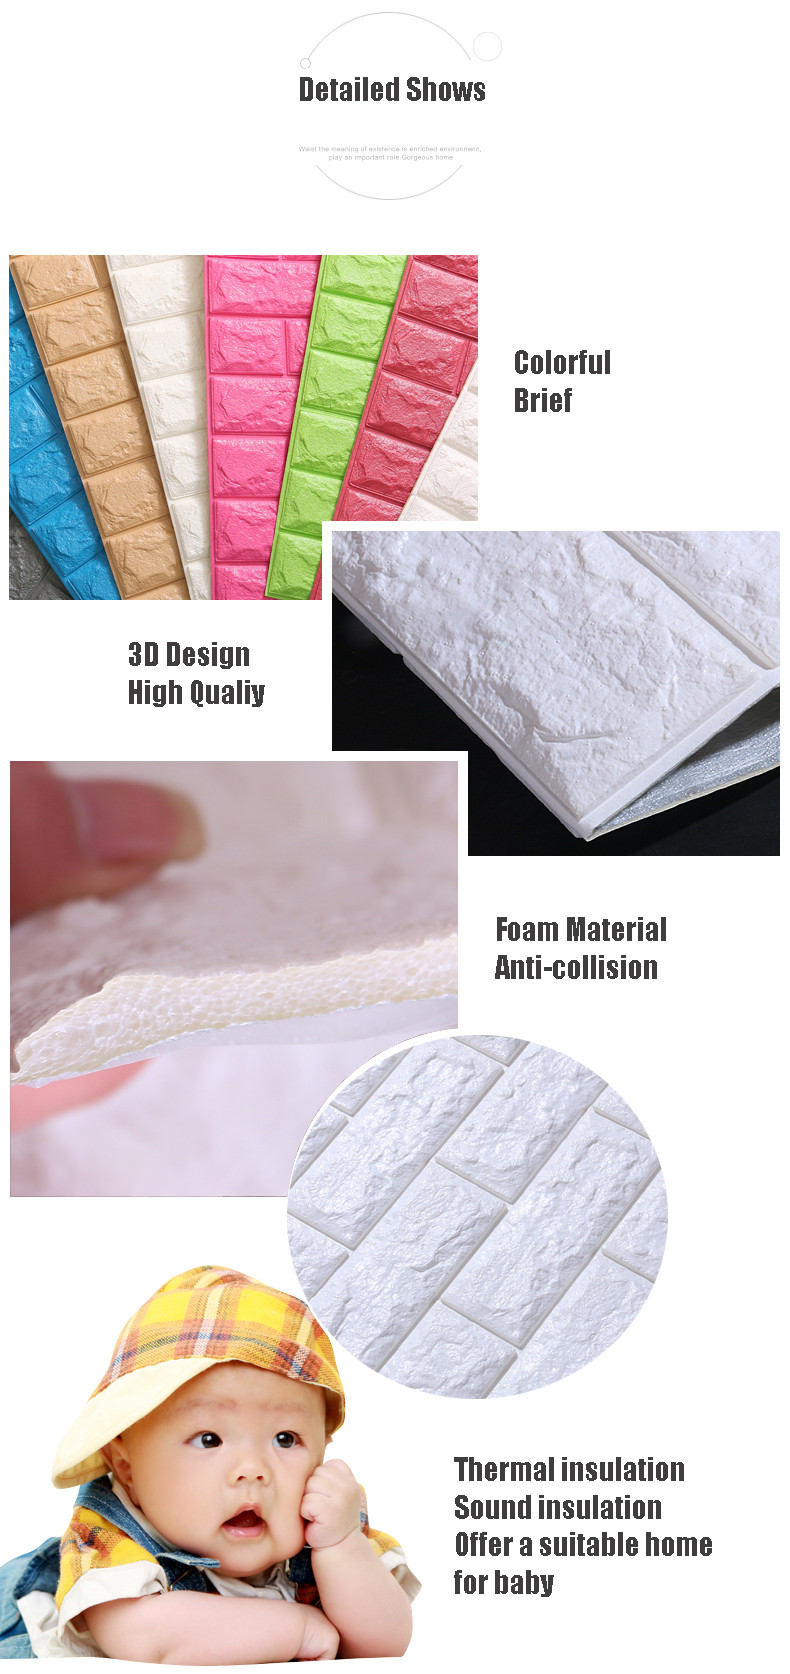 HTB1R00lOXXXXXXRXpXXq6xXFXXXx - DIY Self Adhesive 3D Wall Stickers Bedroom Decor Foam Brick Room Decor Wallpaper Wall Decor Living Wall Sticker For Kids Room